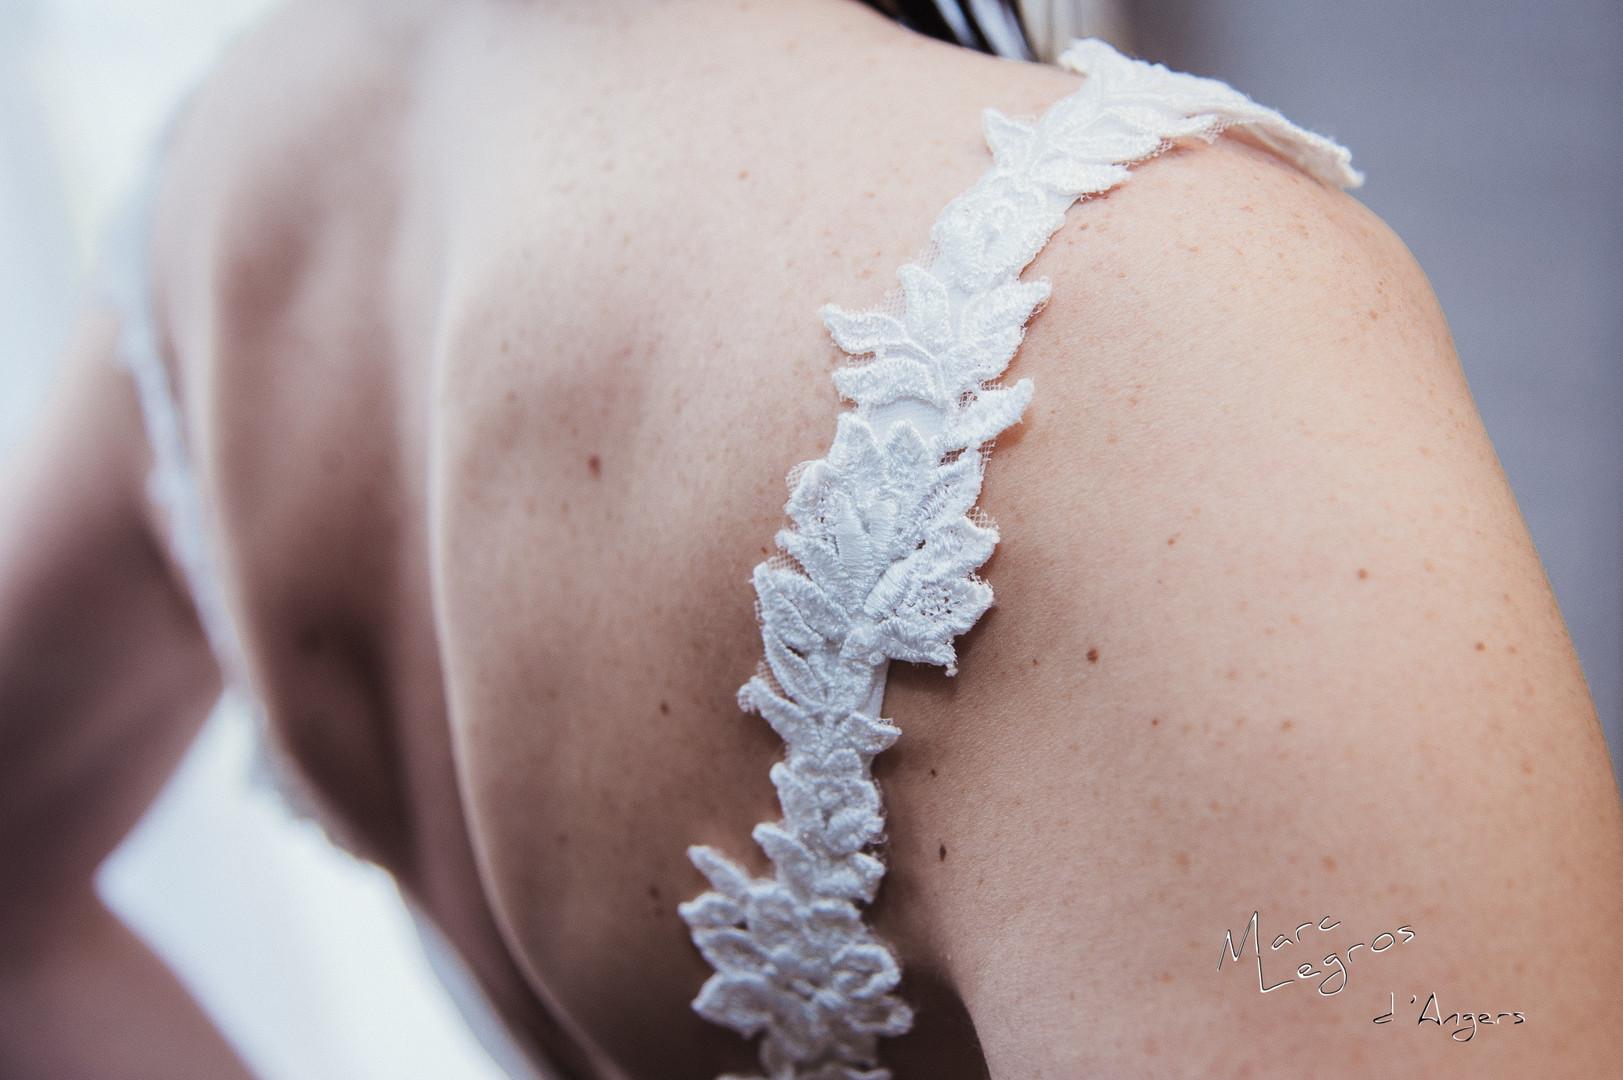 Photographe angers mariage Detail dentelle